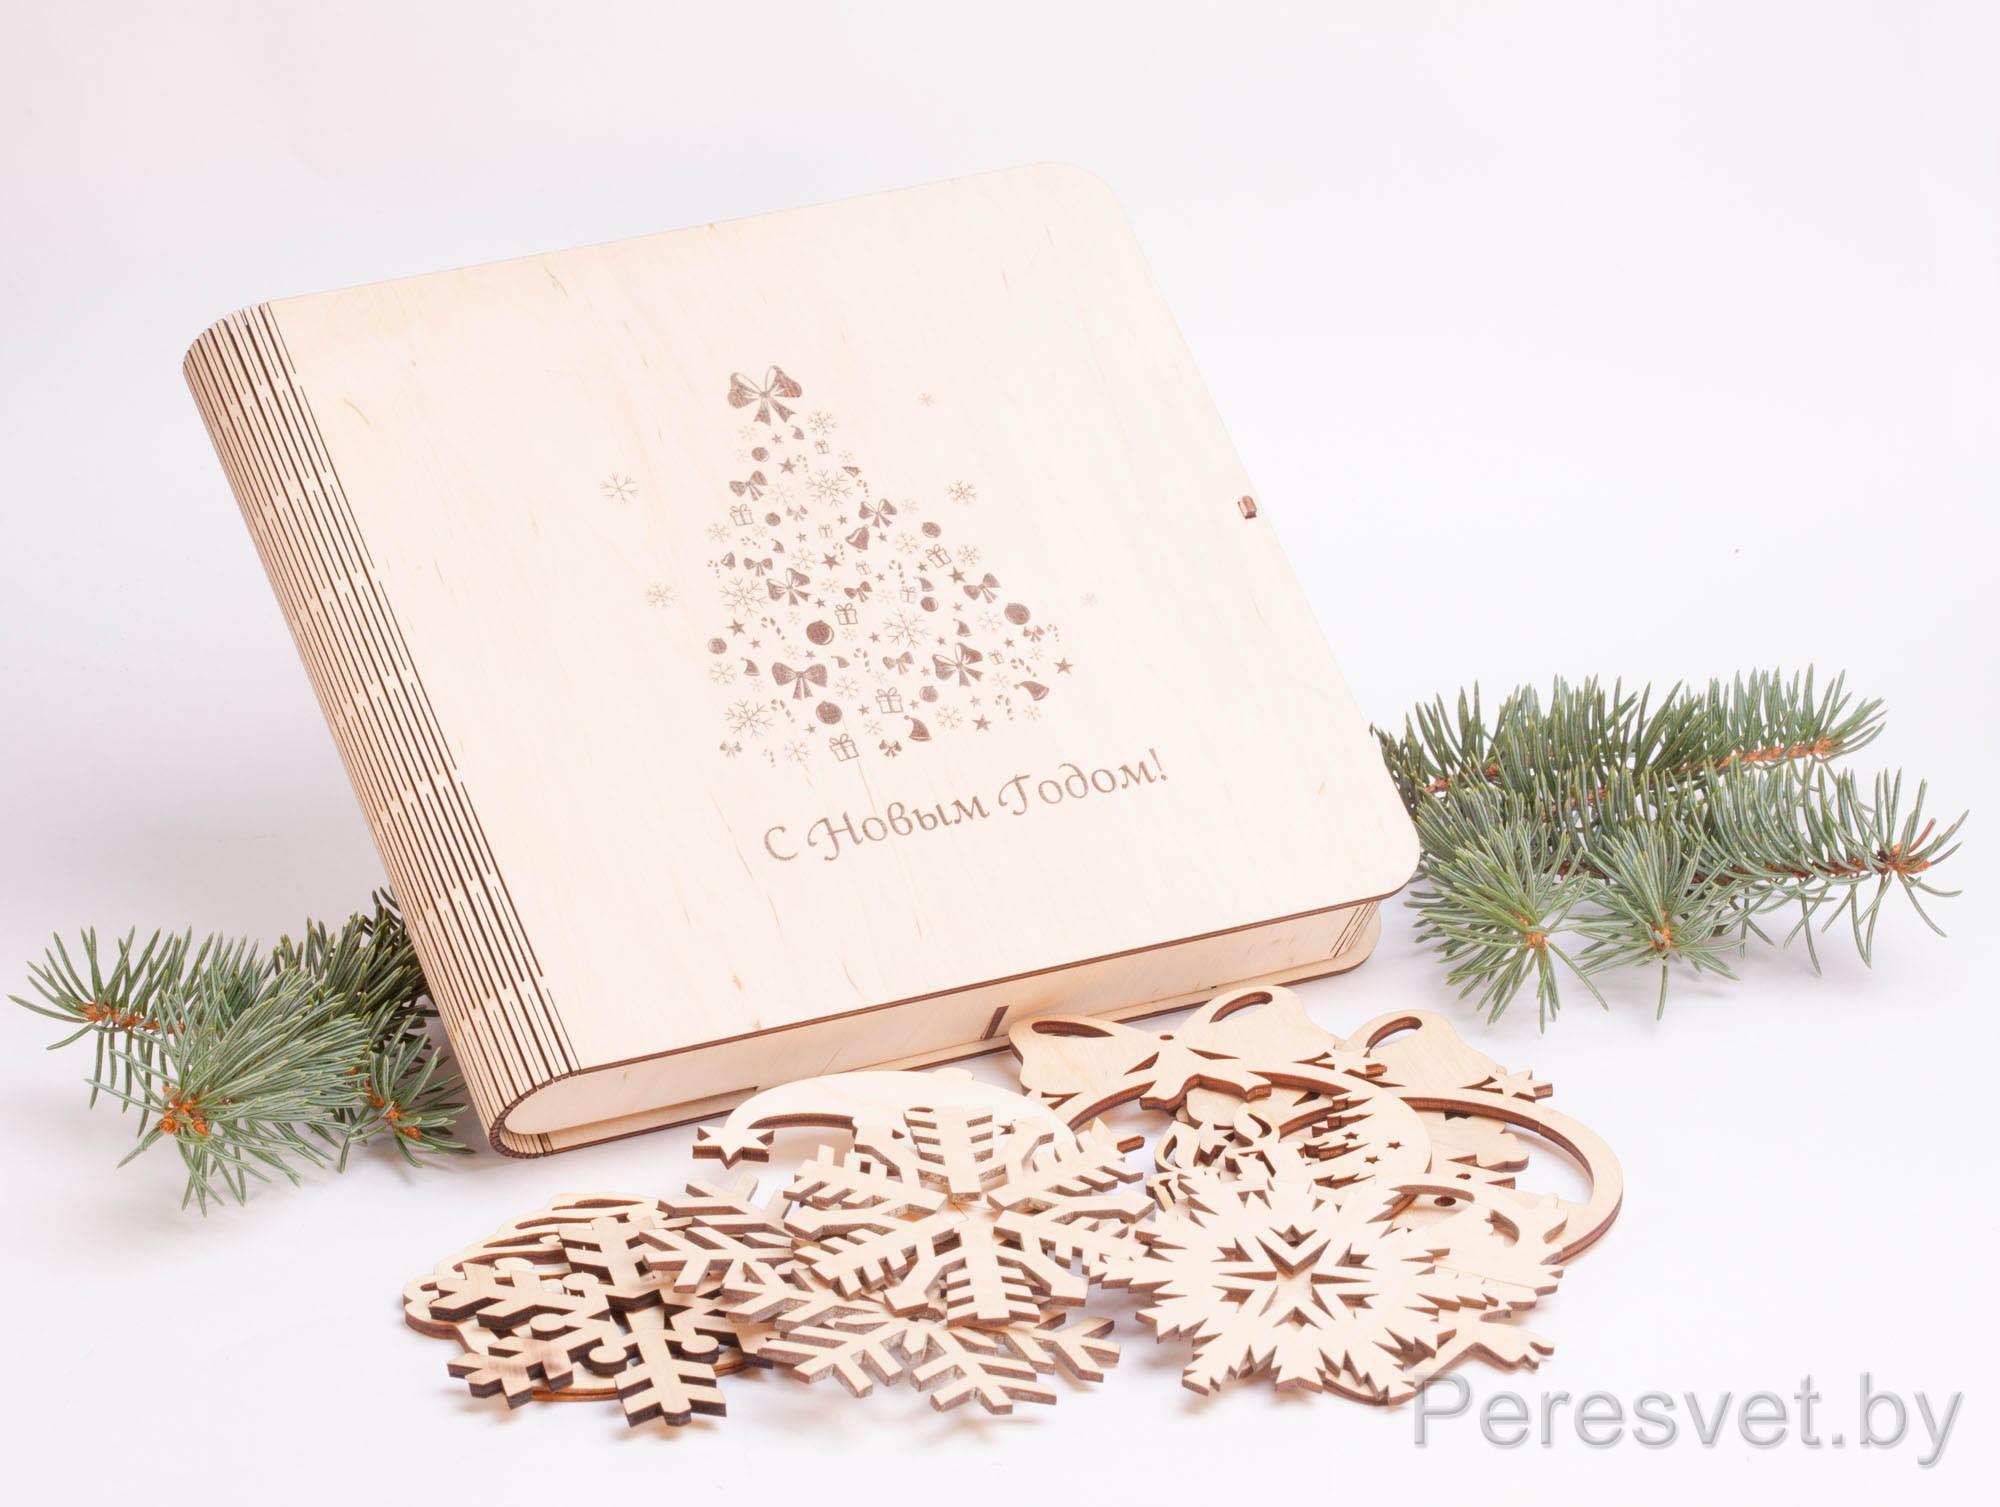 Новогодний набор Раскрась снежинку 2020 год на peresvet.by